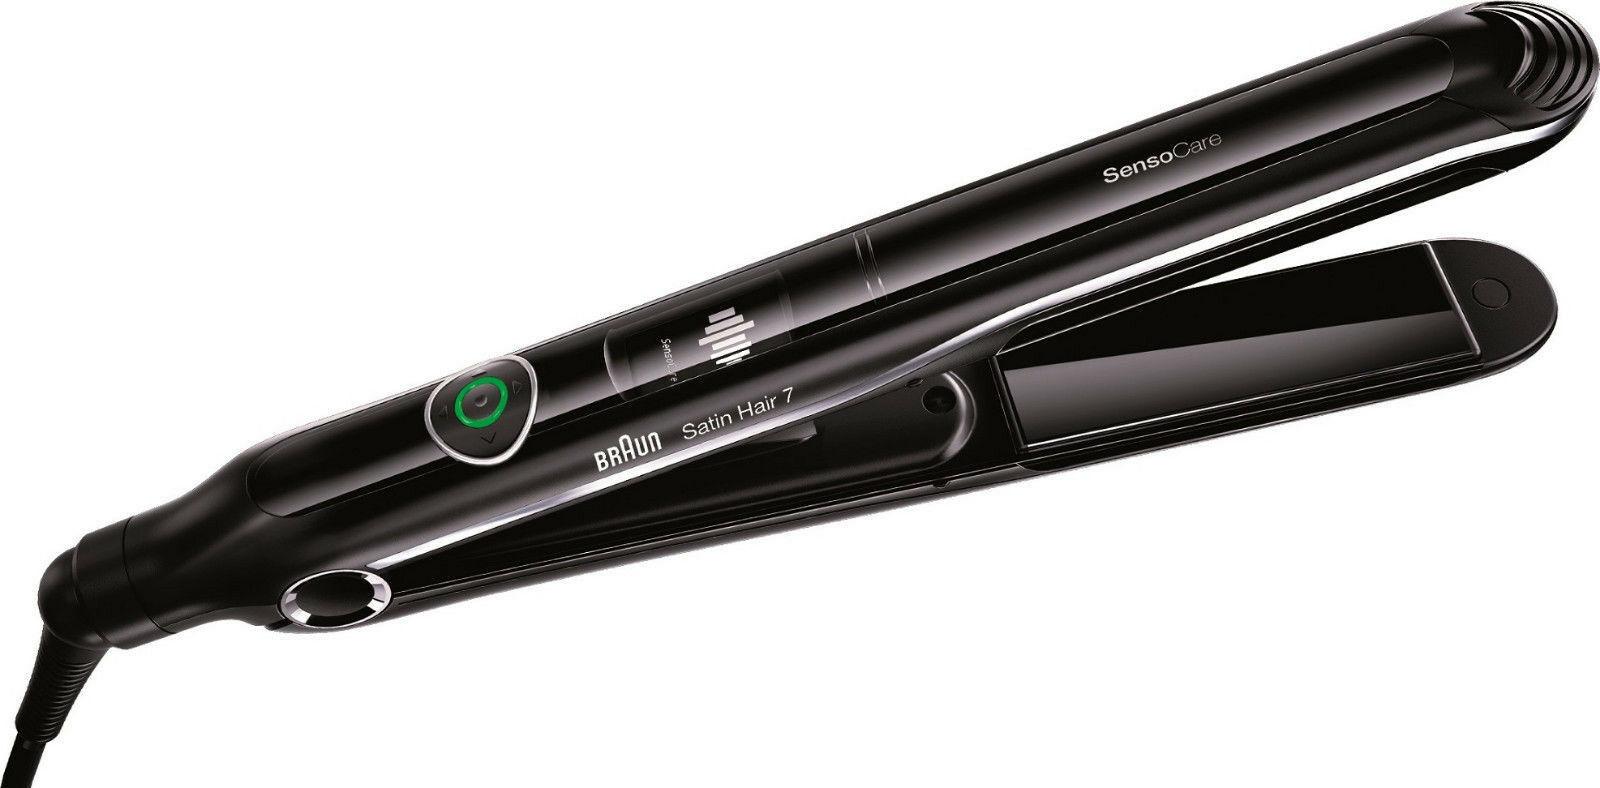 Braun Satin Hair 7 Straightener SensoCare styler ST780 3